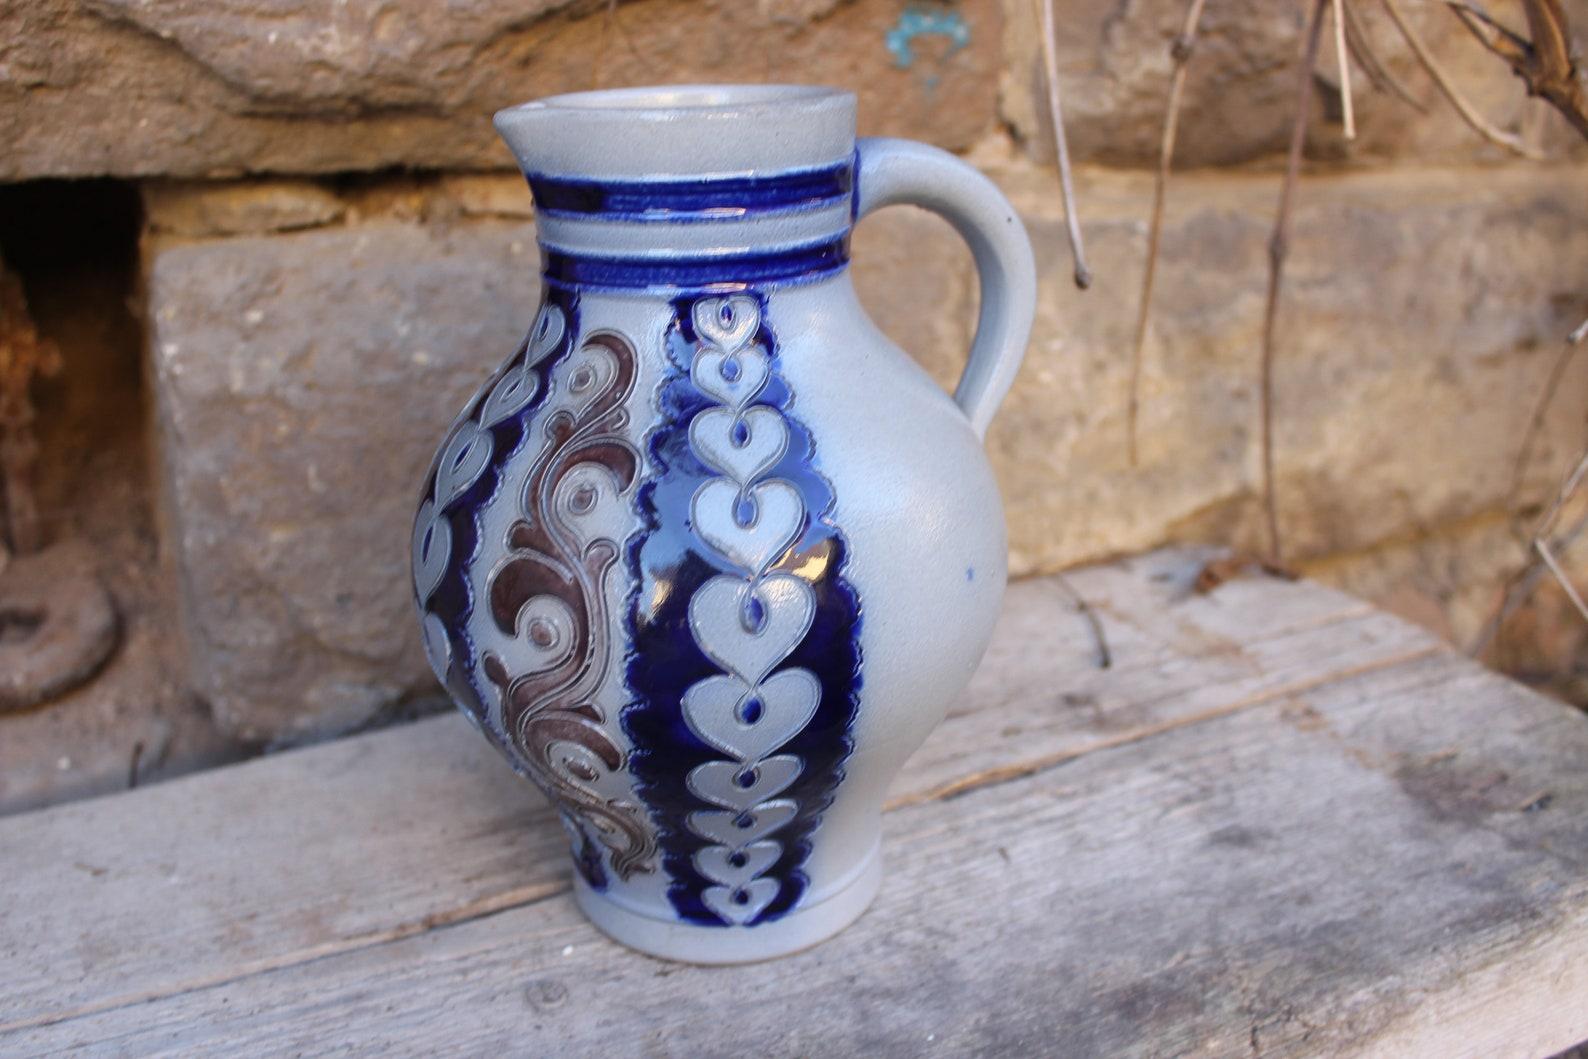 Vintage Jug Wine Jug Bembel 1.5 l Stoneware Merkelbach Westerwald Pottery